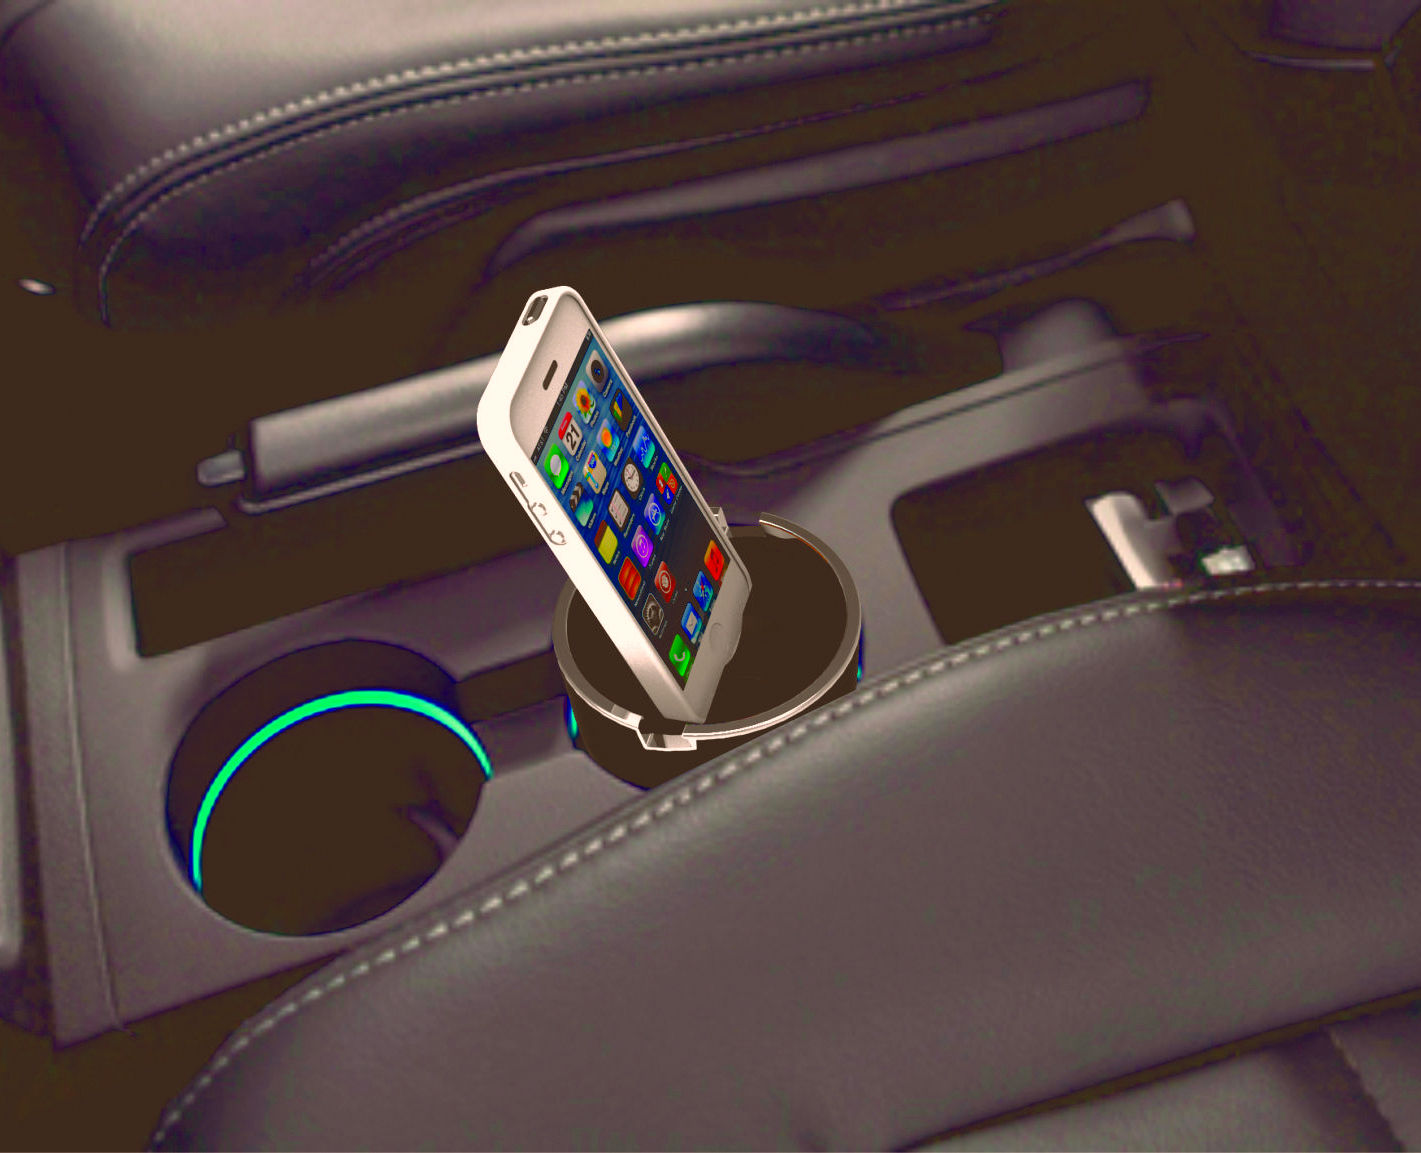 Iphone Car Dock: Custom Car Docks Created A Hands-free IPhone Car Docking